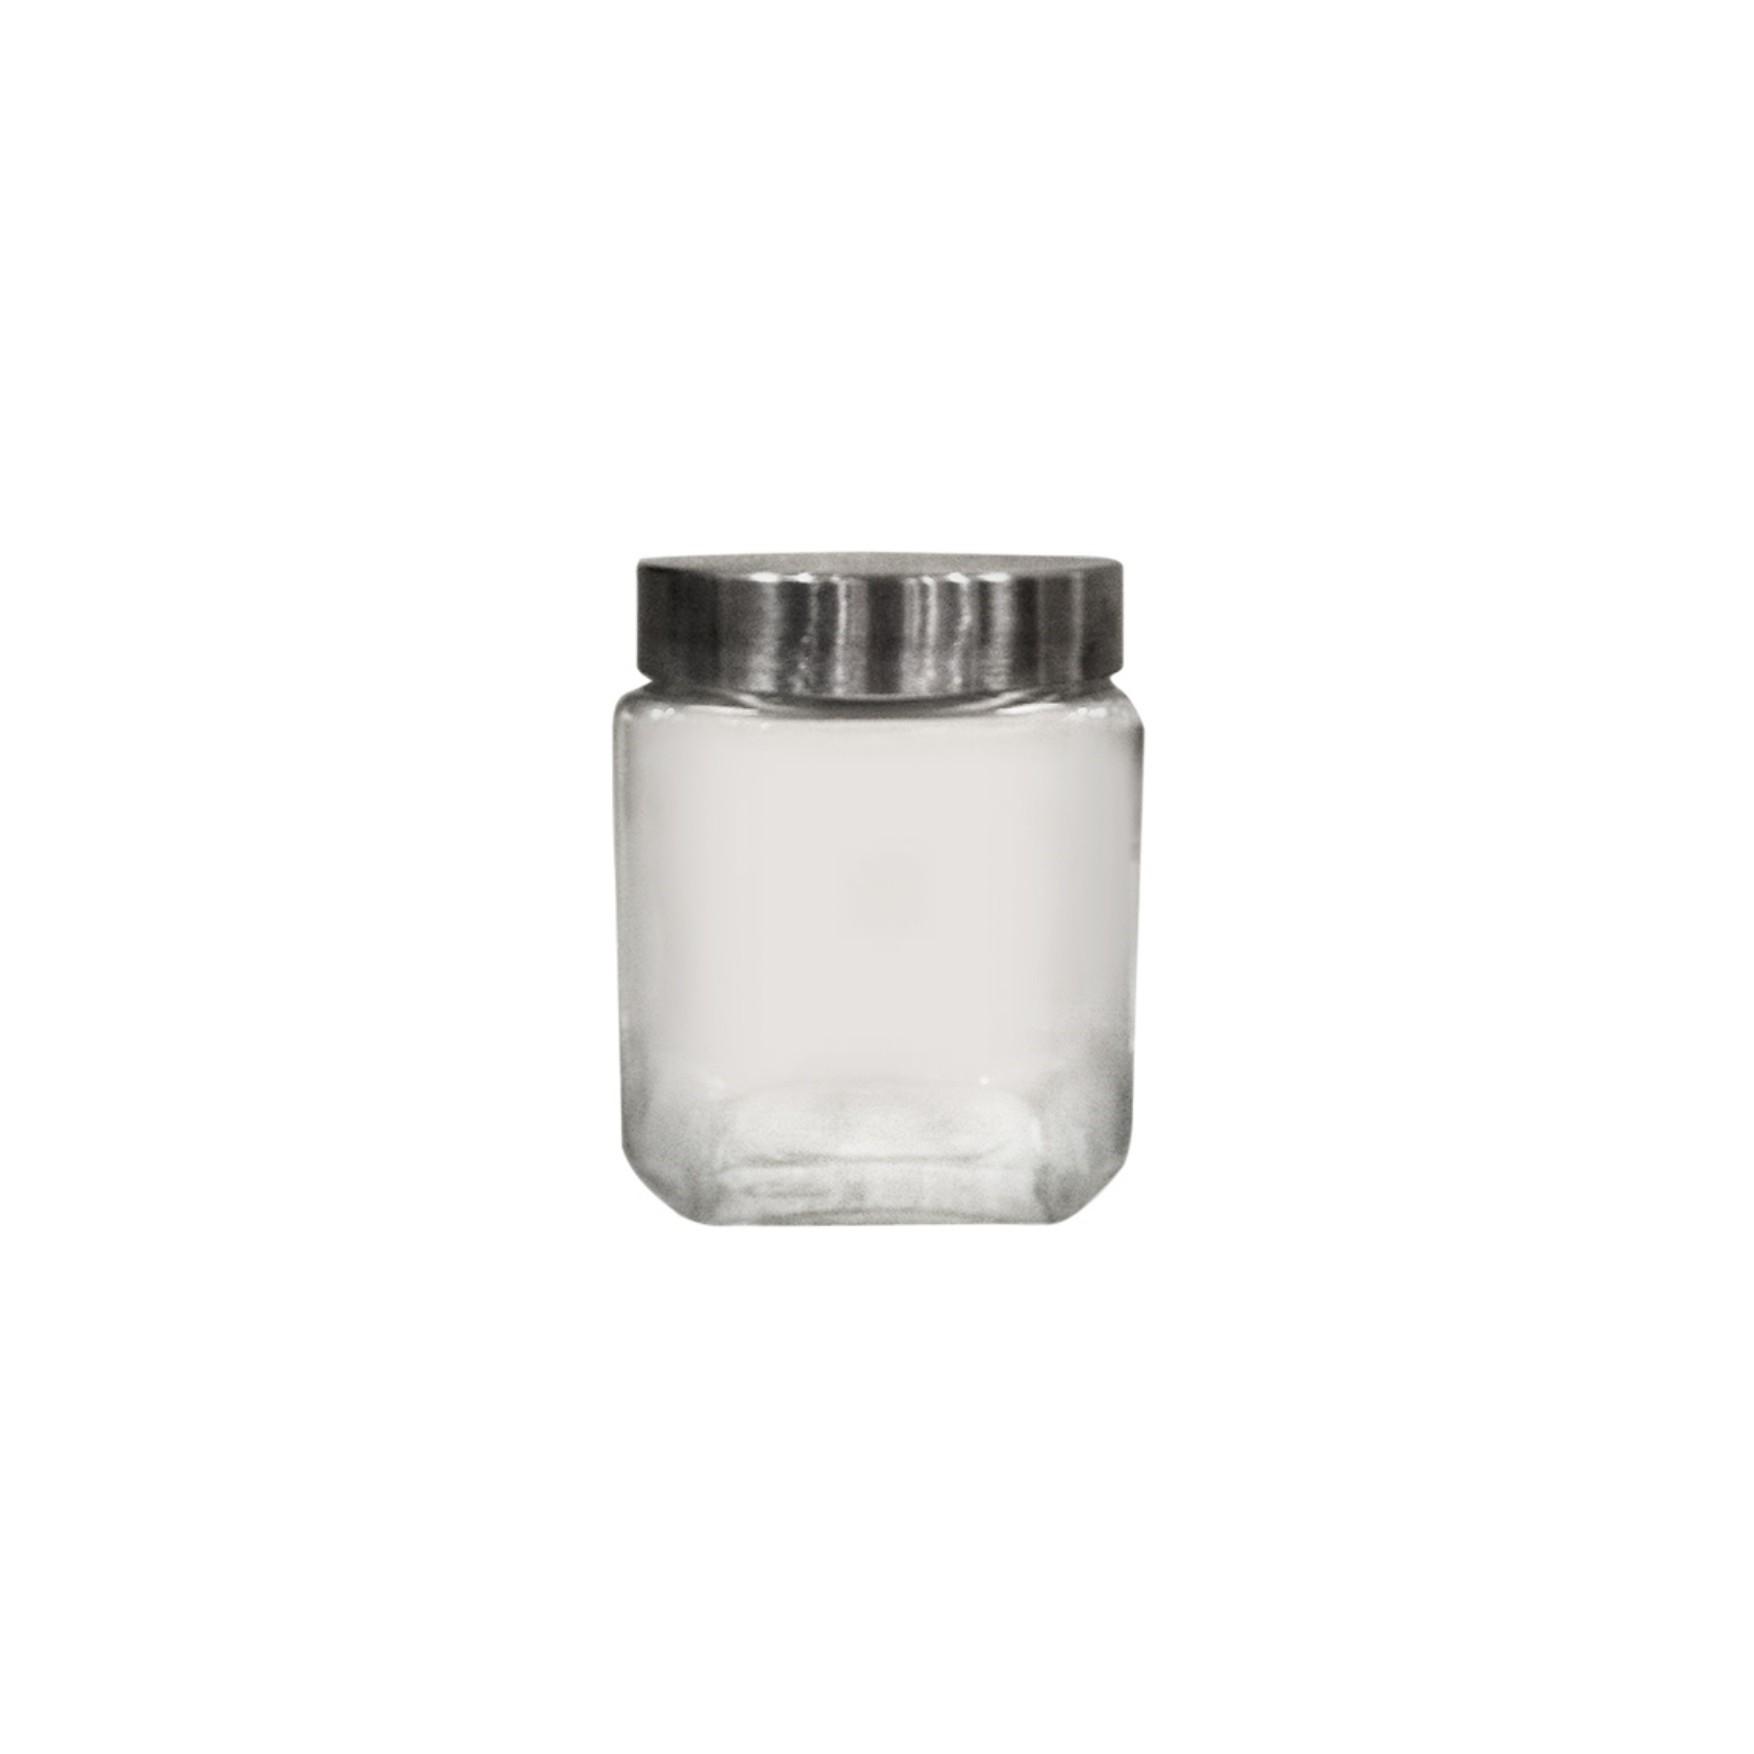 Pote para Biscoito de Vidro Quadrado 12L com Tampa Branco - Full fit